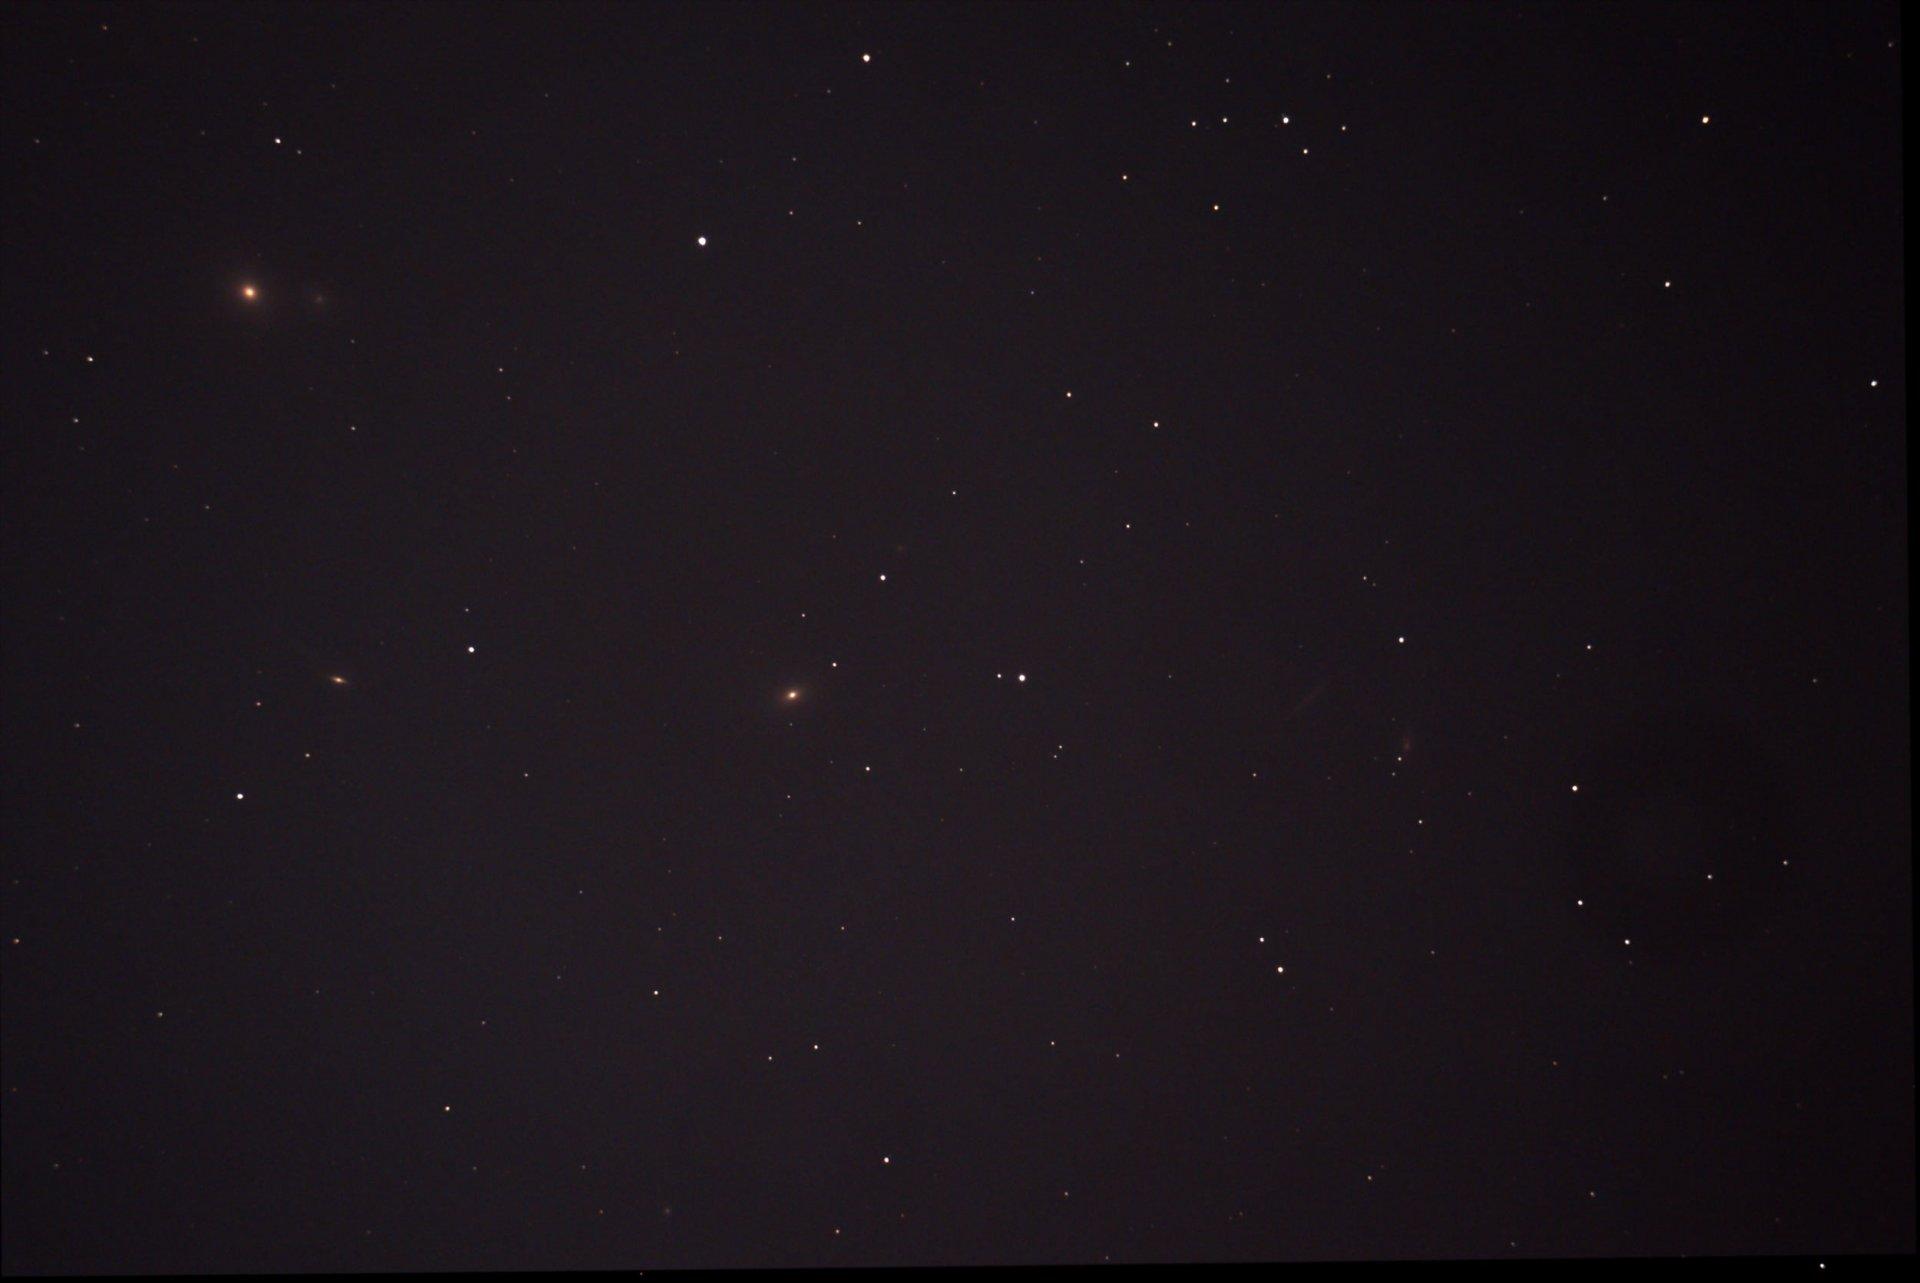 M59_NGC4638_202104-23_2500.jpg